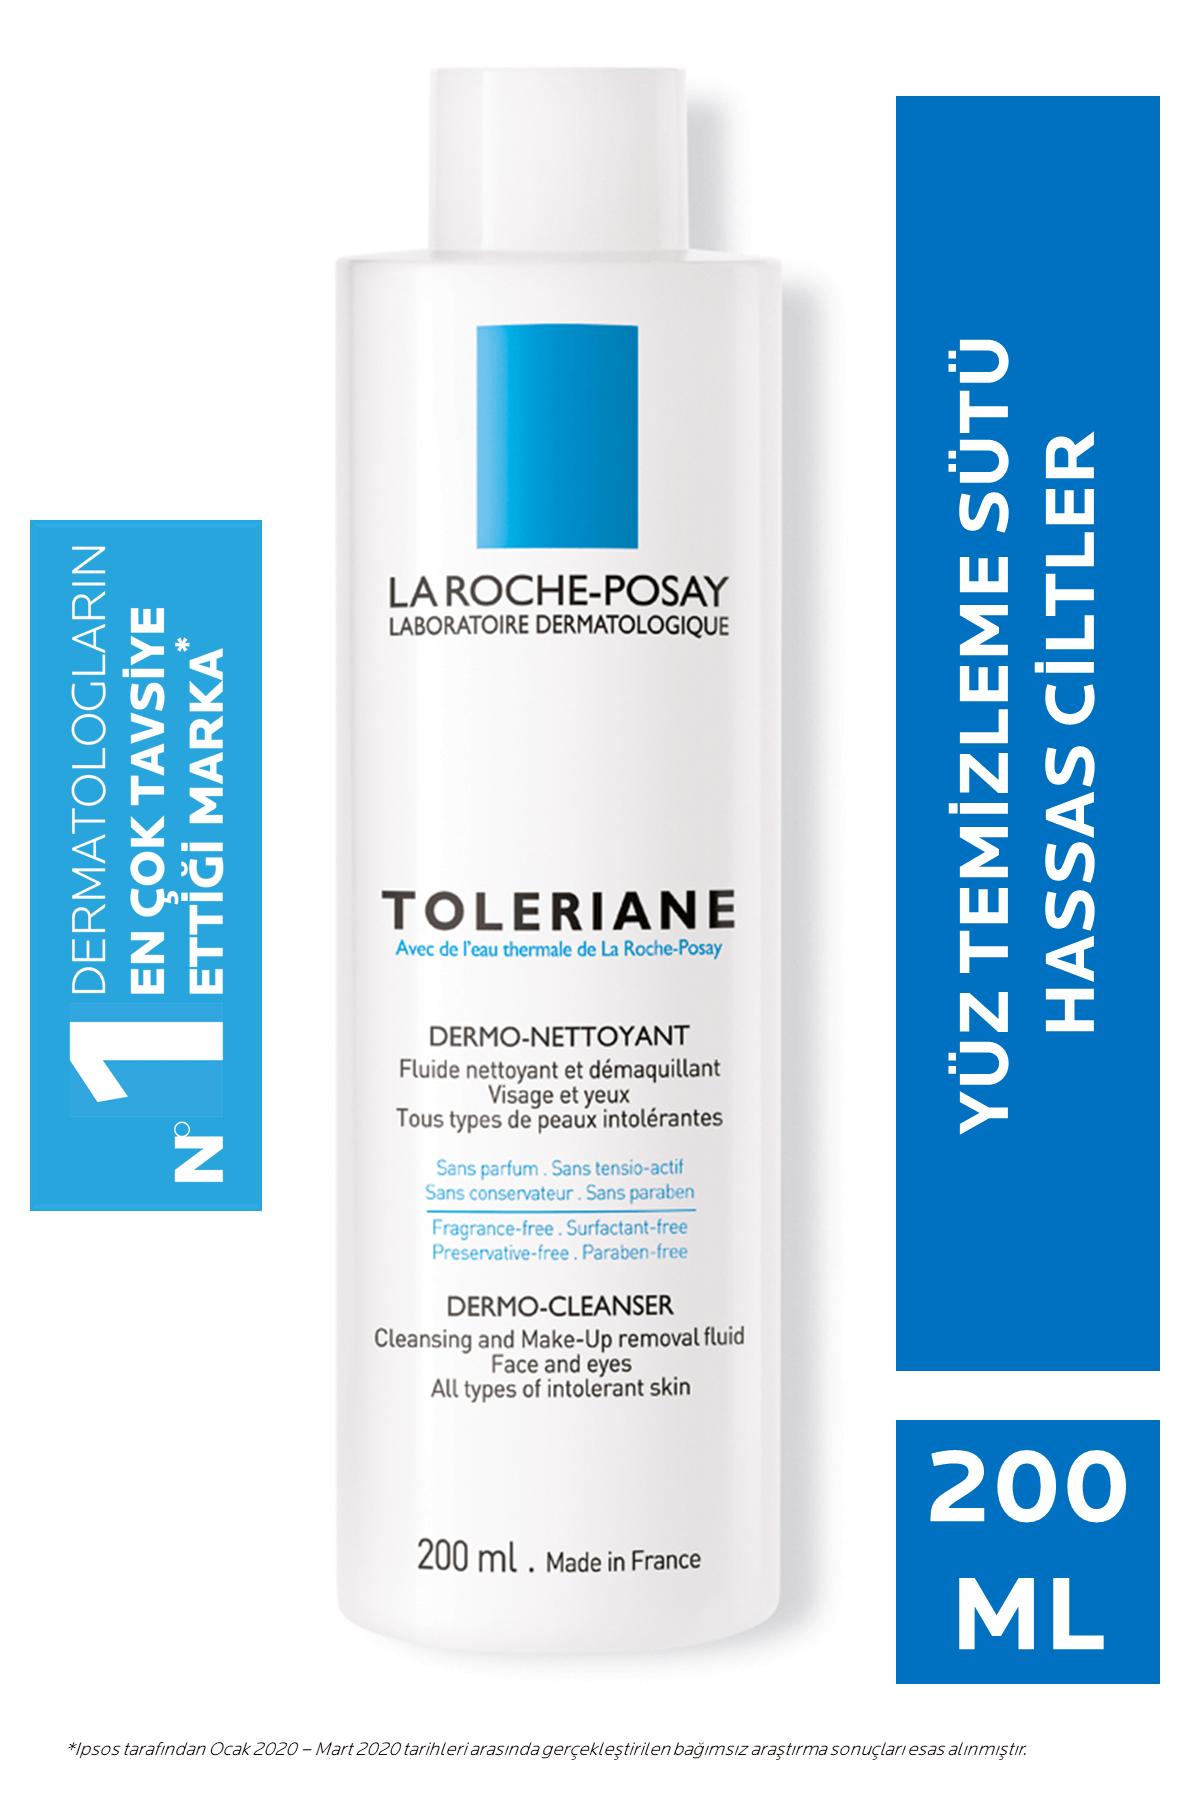 La Roche Posay Toleriane Dermo Nettoyant Temizleme Sütü Ultra Hassas Ciltler 200 ml 3433422406599